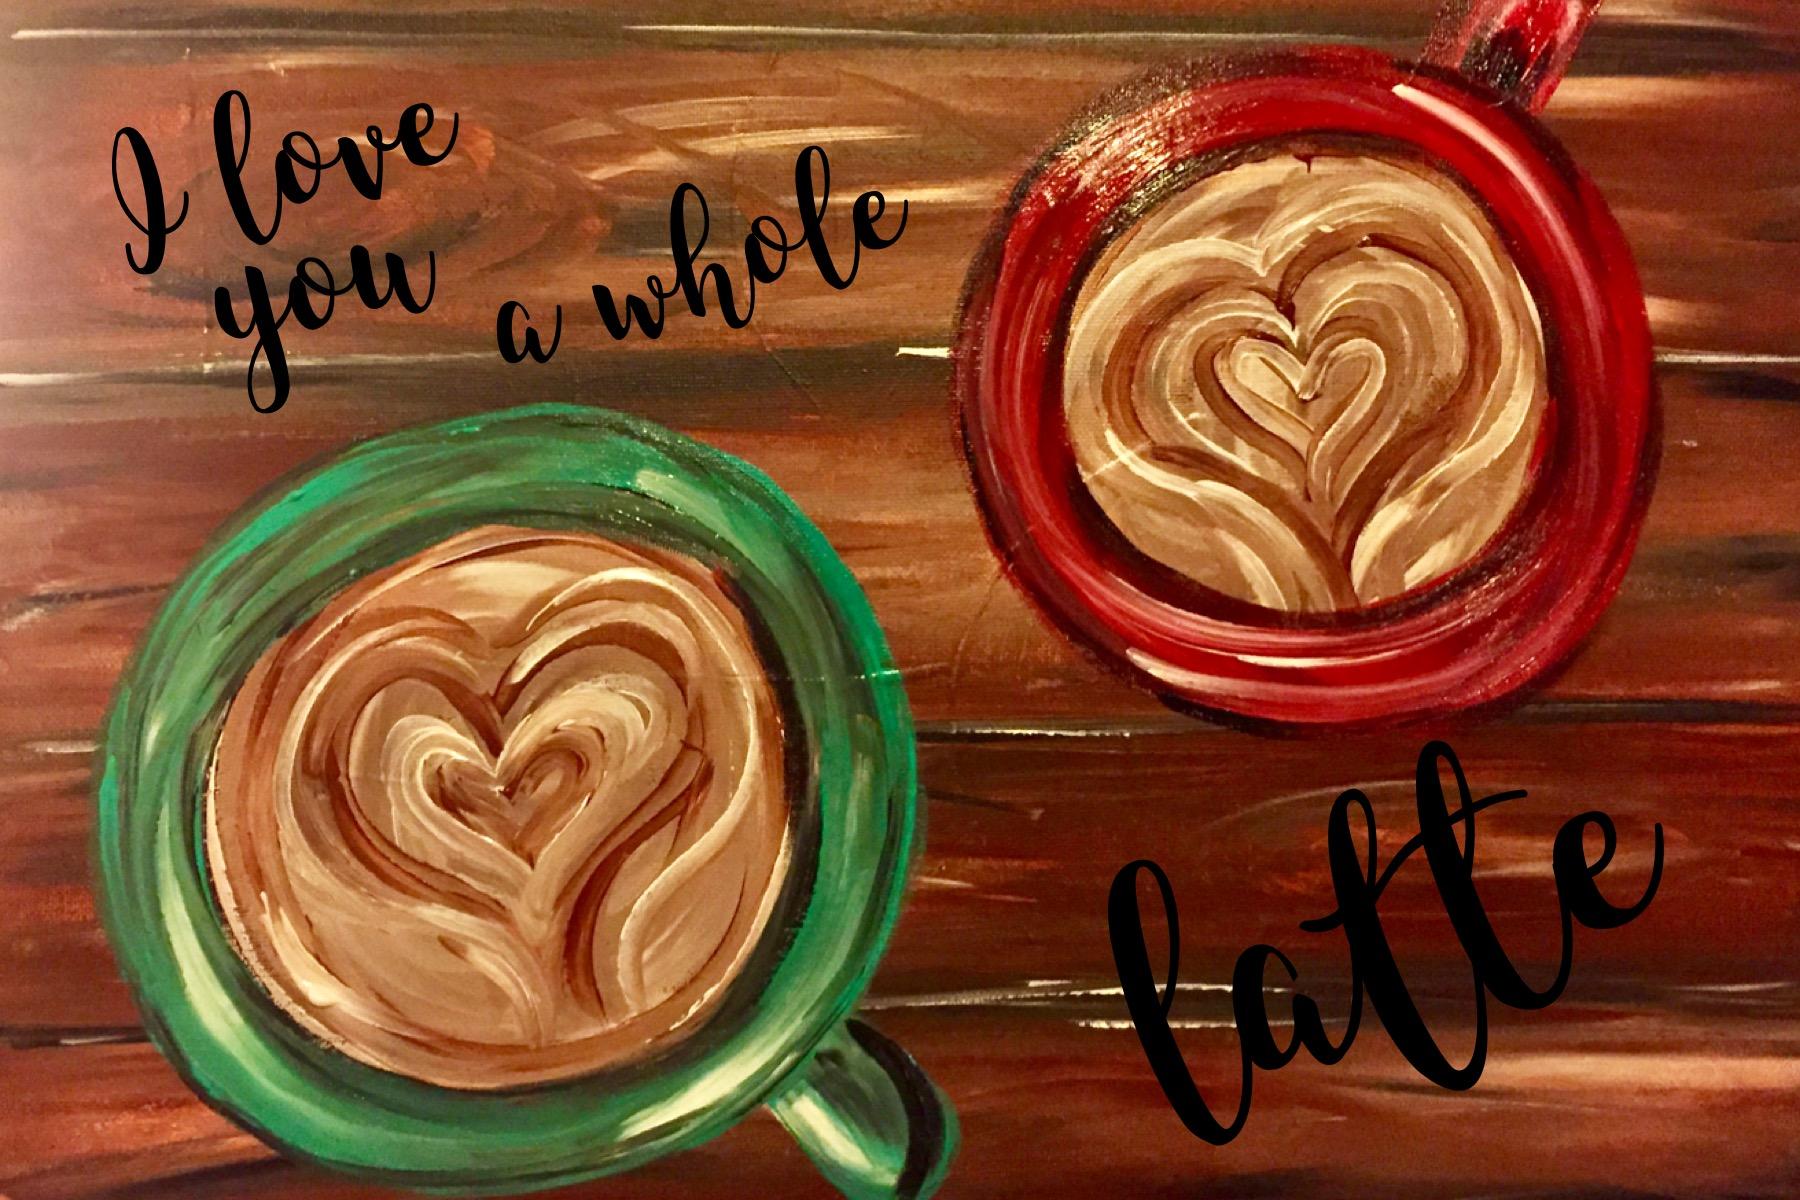 I love you a whole latte